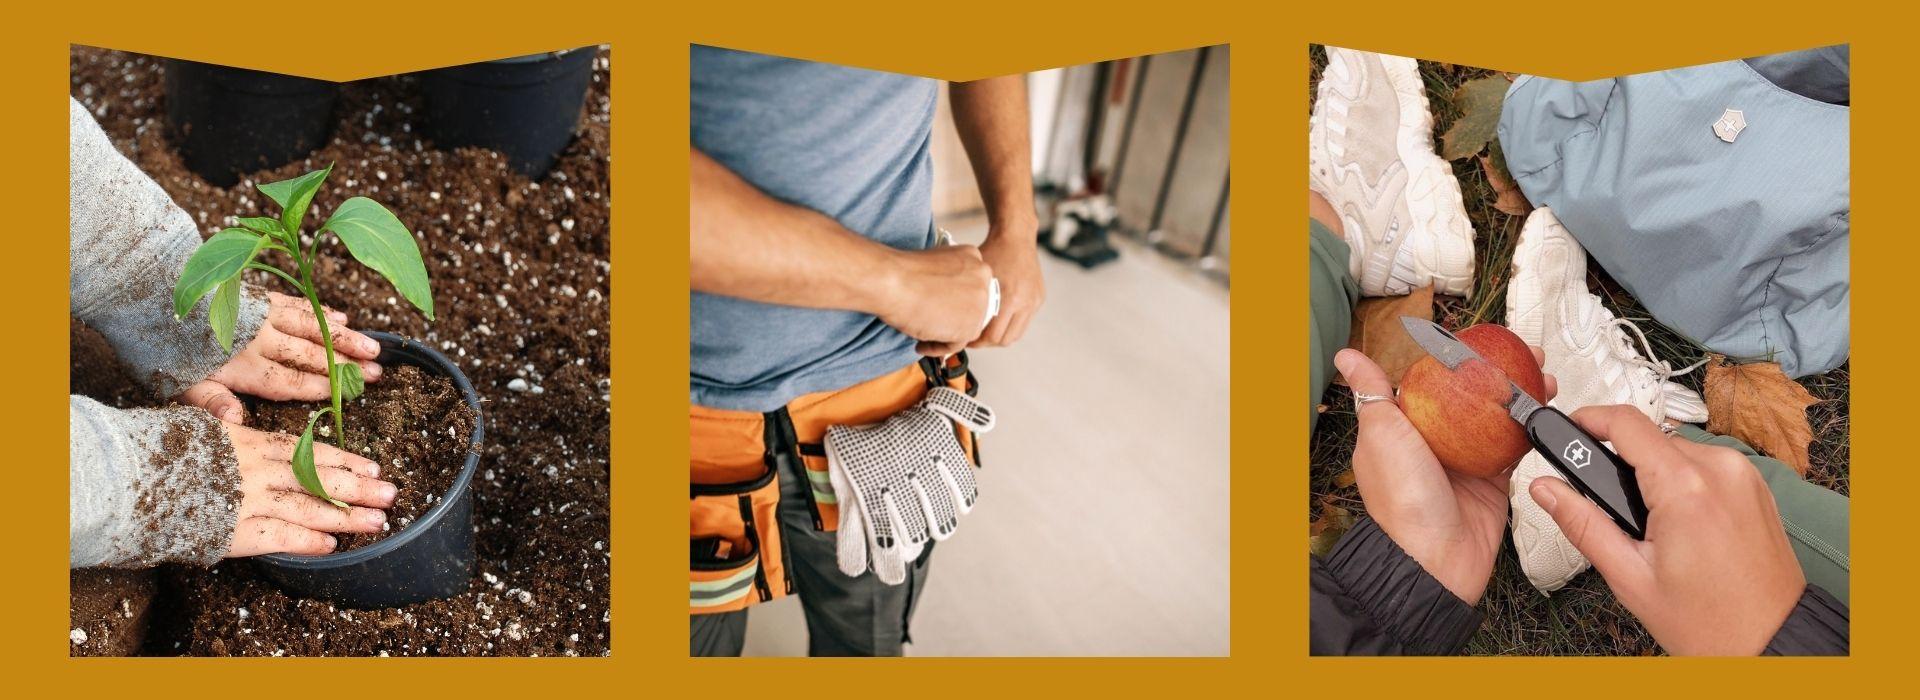 Gardening tools, tool belt, swiss army knife